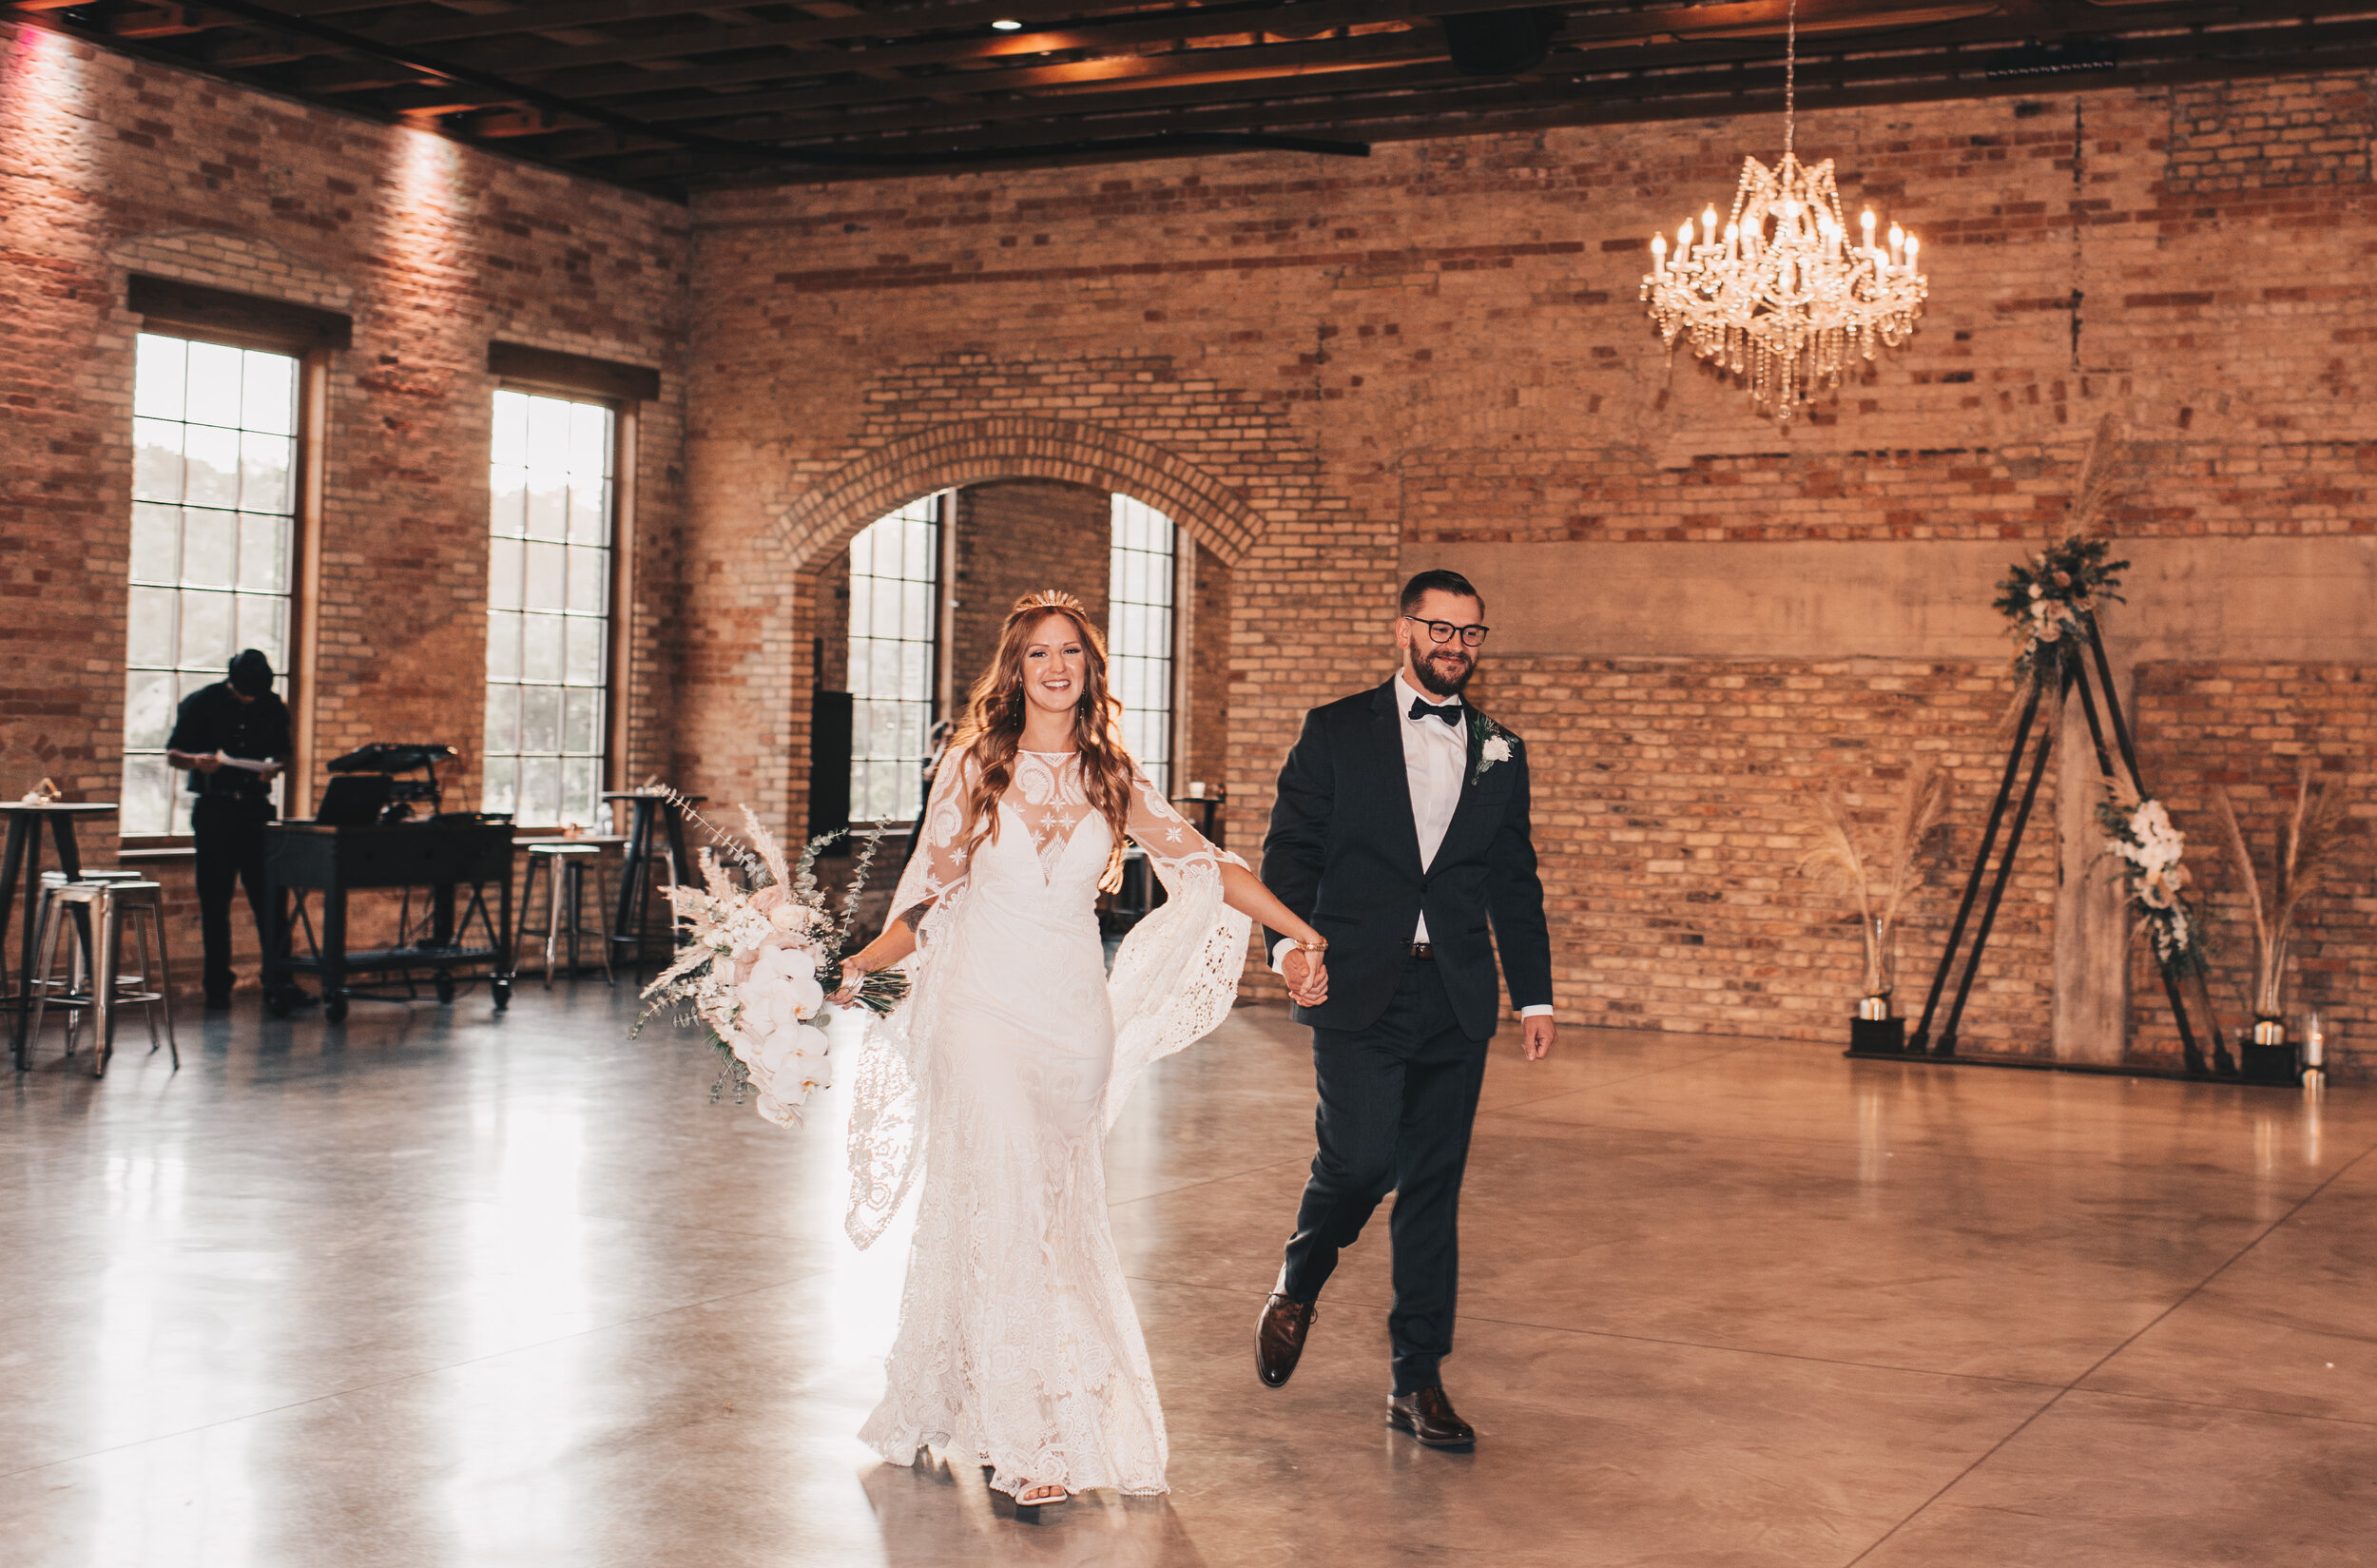 Modern Industrial Wedding, The Brix on the Fox, The BRIX, Chicago Industrial Wedding, Modern Midwest Wedding, The Brix on the Fox Wedding, The BRIX Wedding, Industrial Wedding Detail Photos